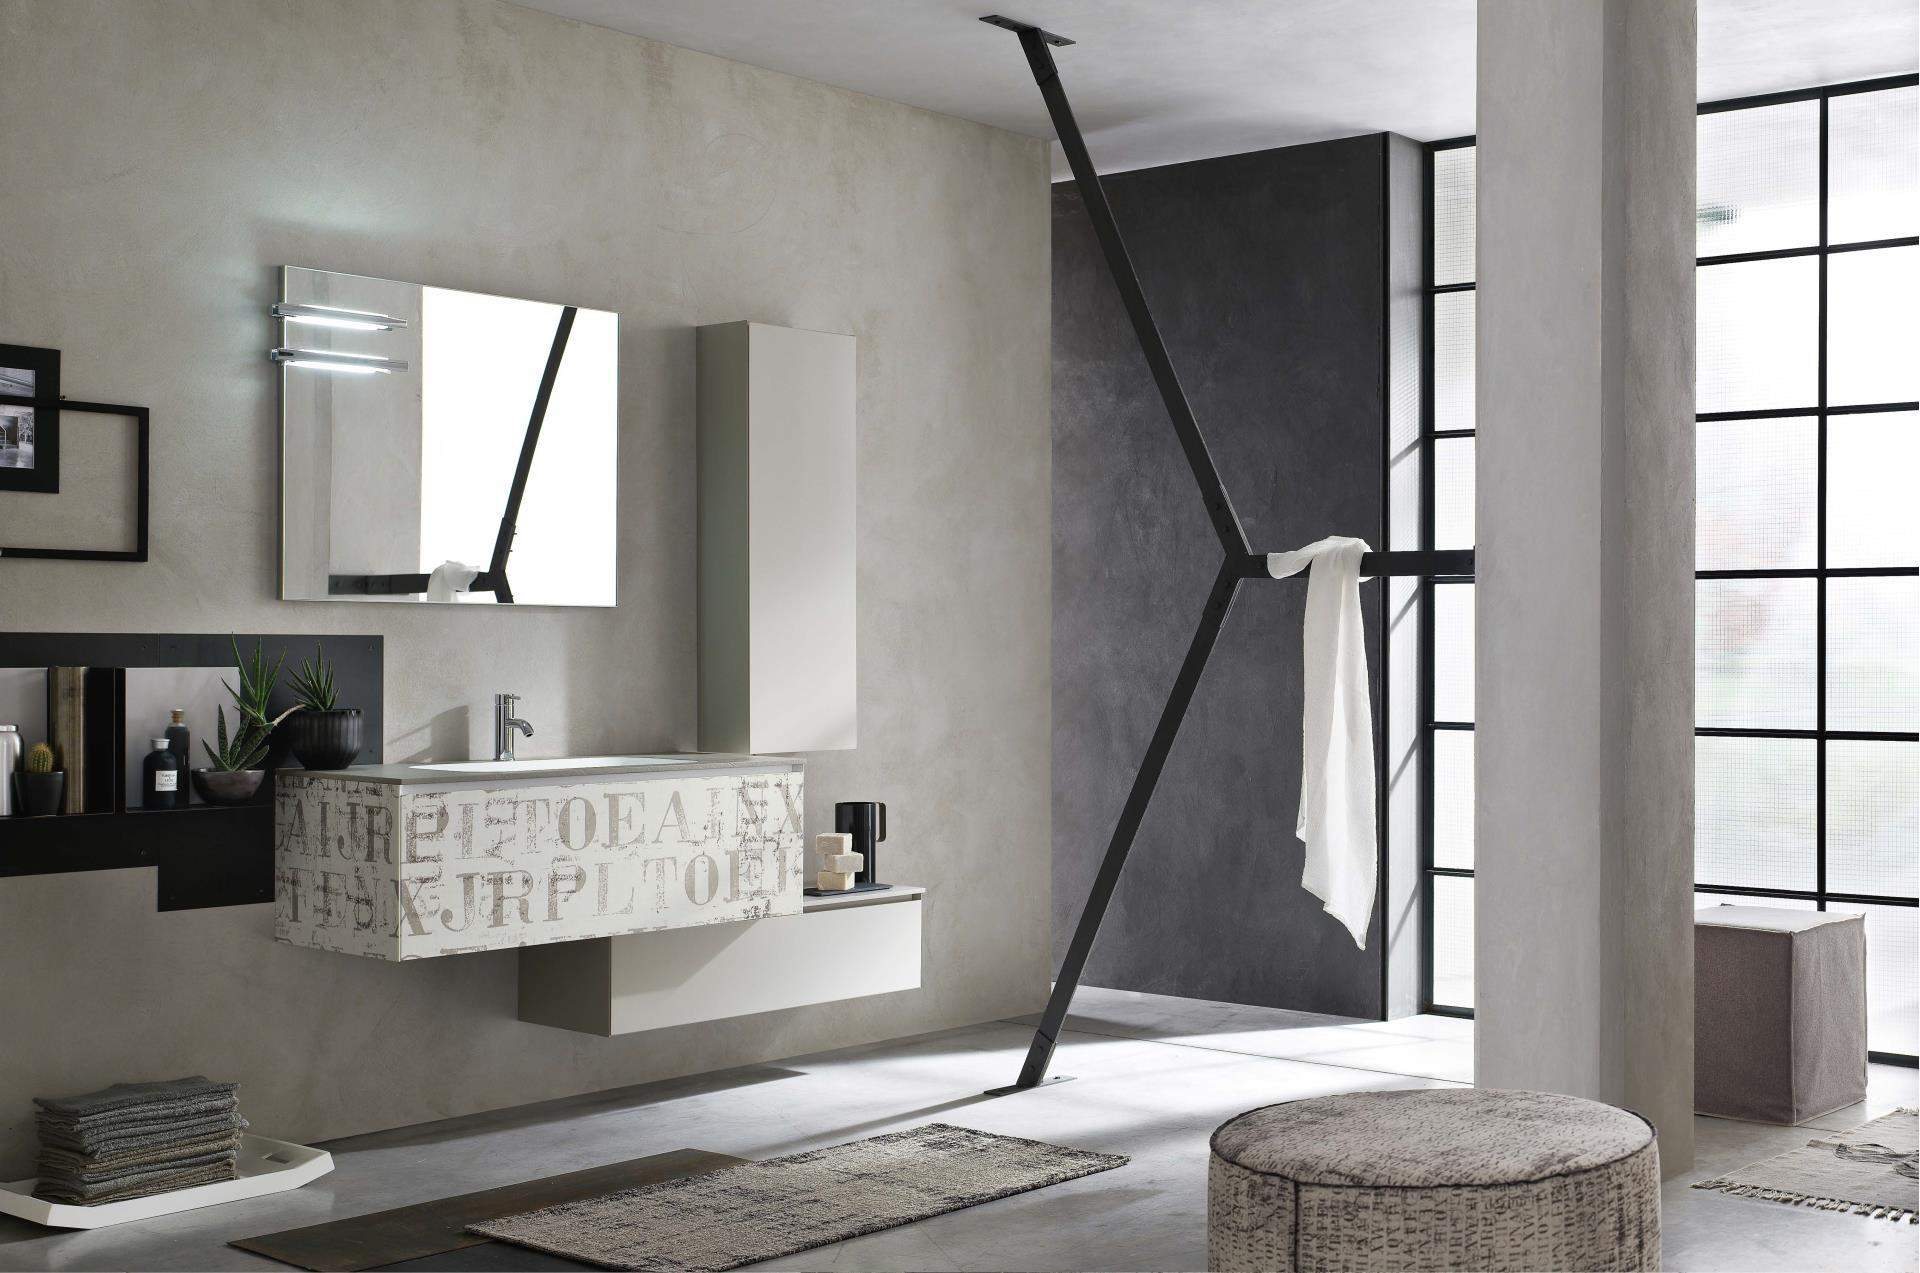 Fliesen sanitäre & badeinrichtung südtirol fenice design badmöbel